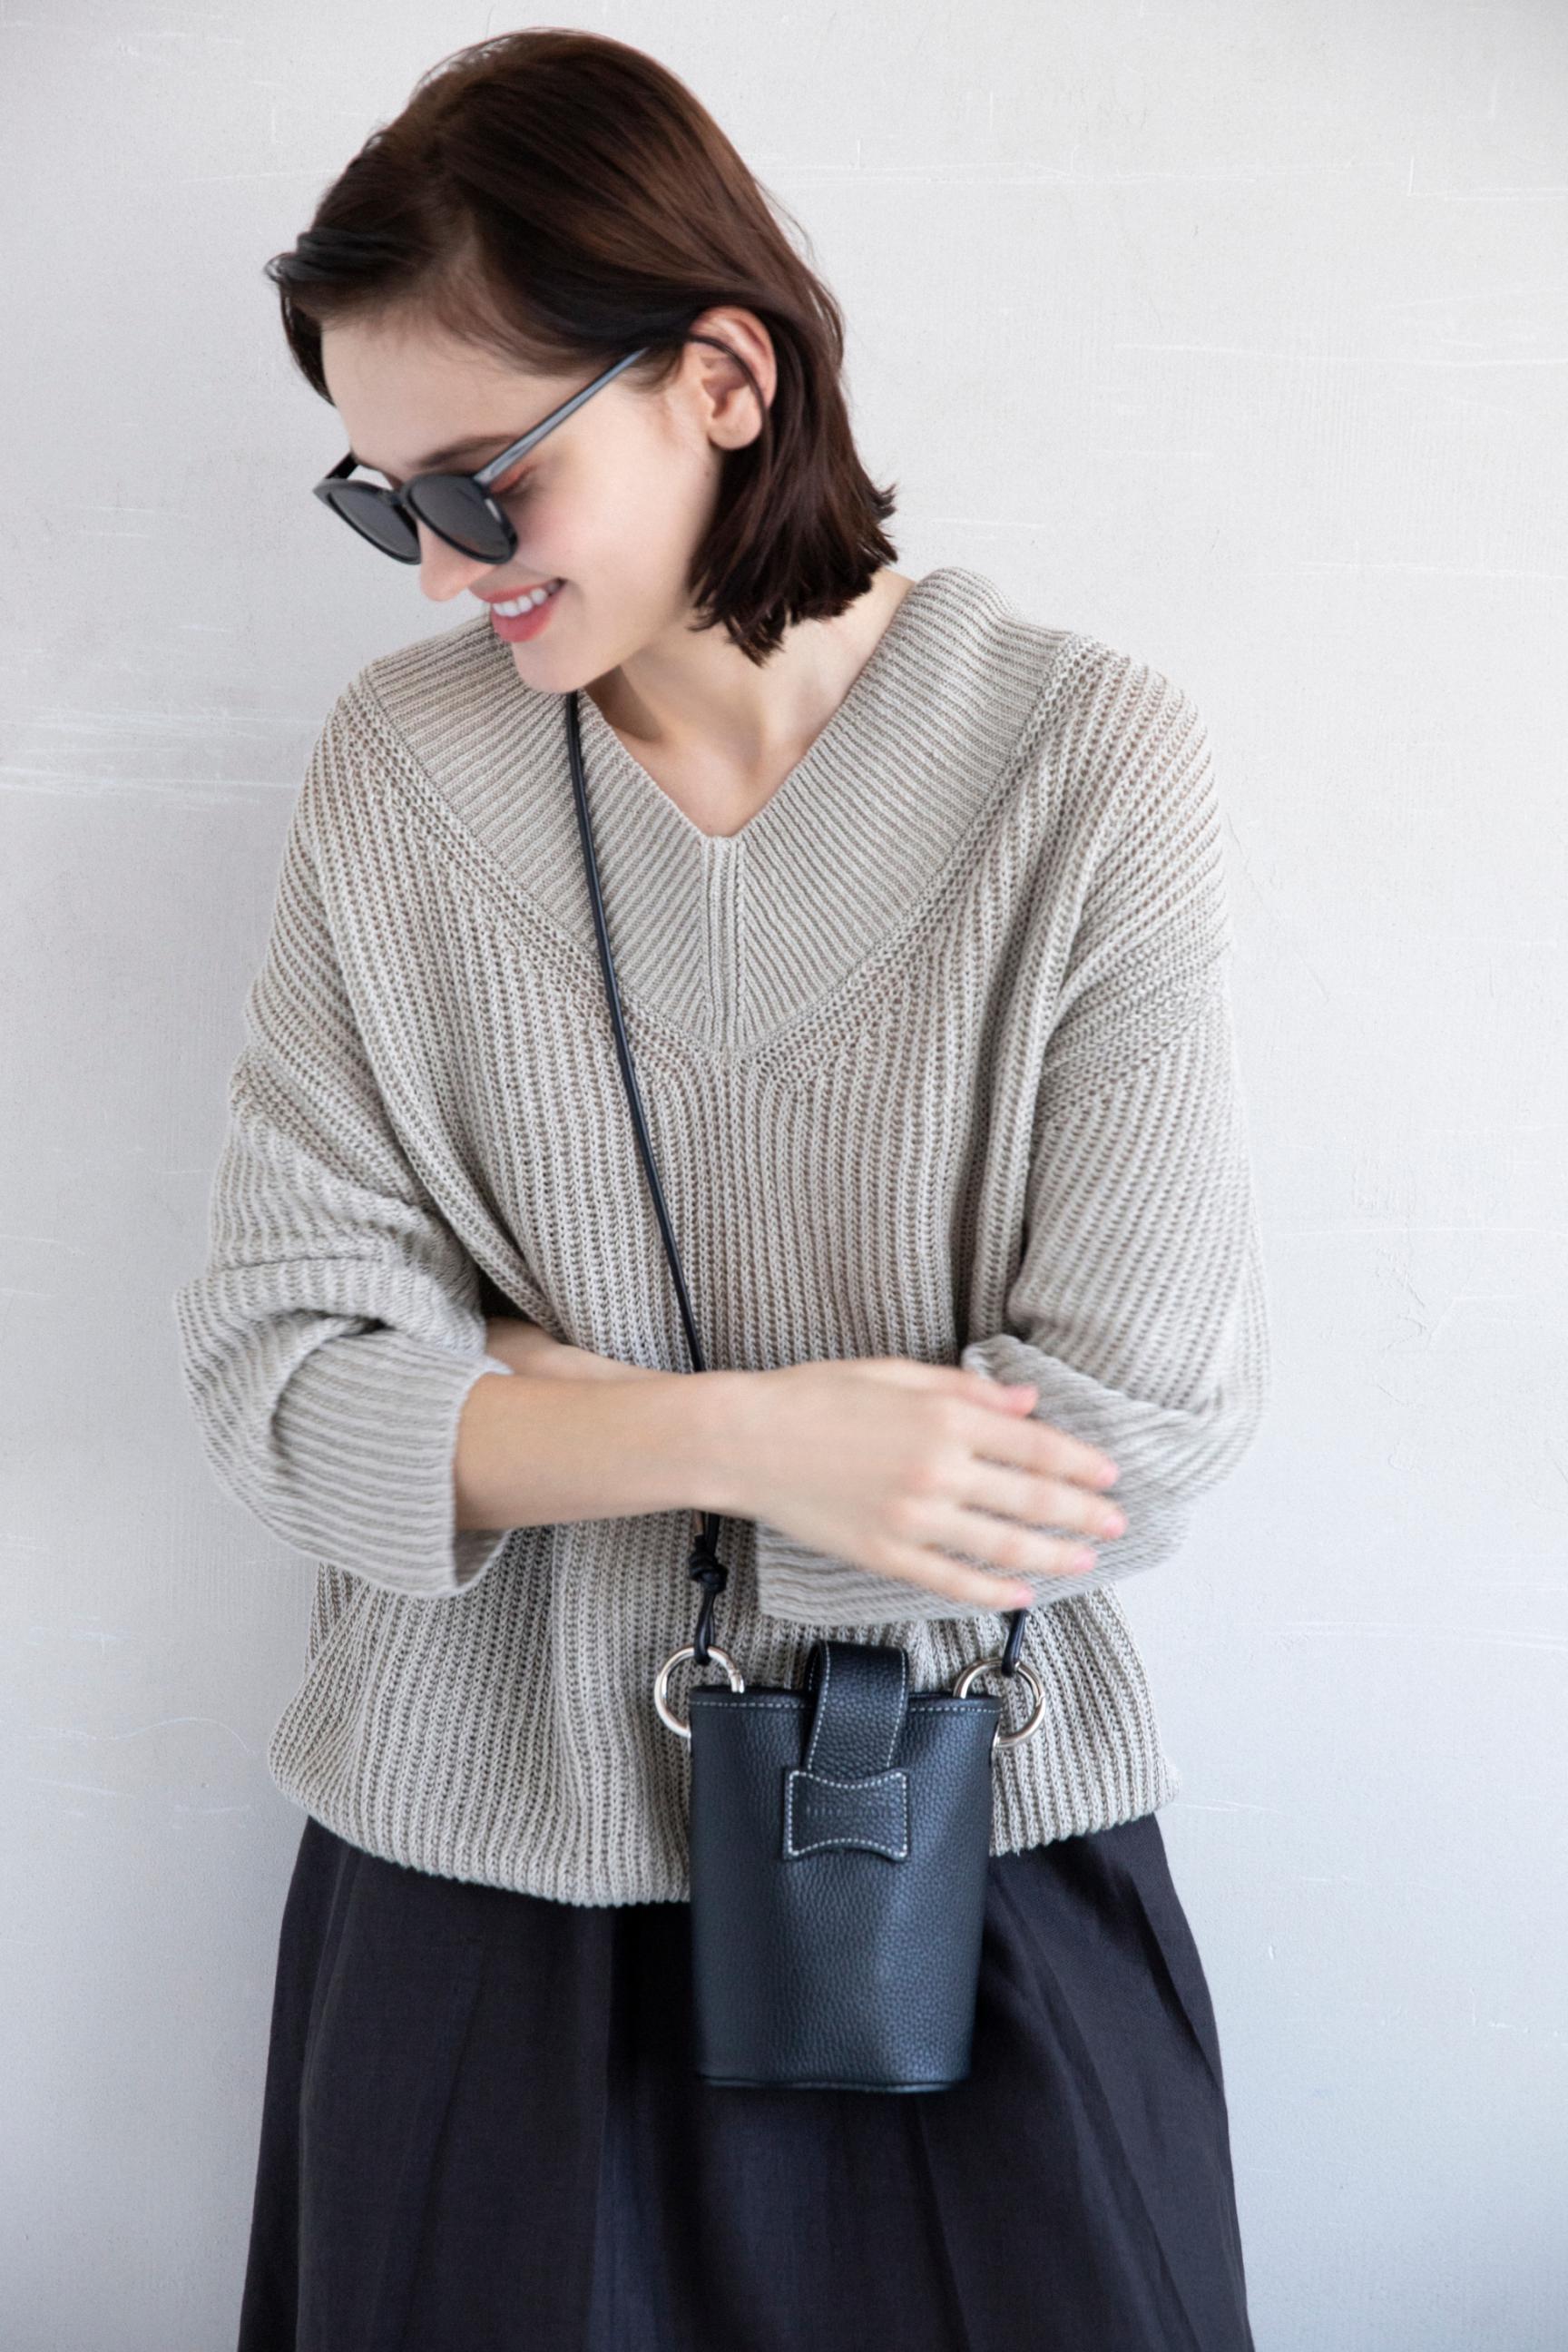 39_1 knit¥25,300 skirt¥31,900 sunglasses¥20,900 bag¥24,200 shoes¥13,200